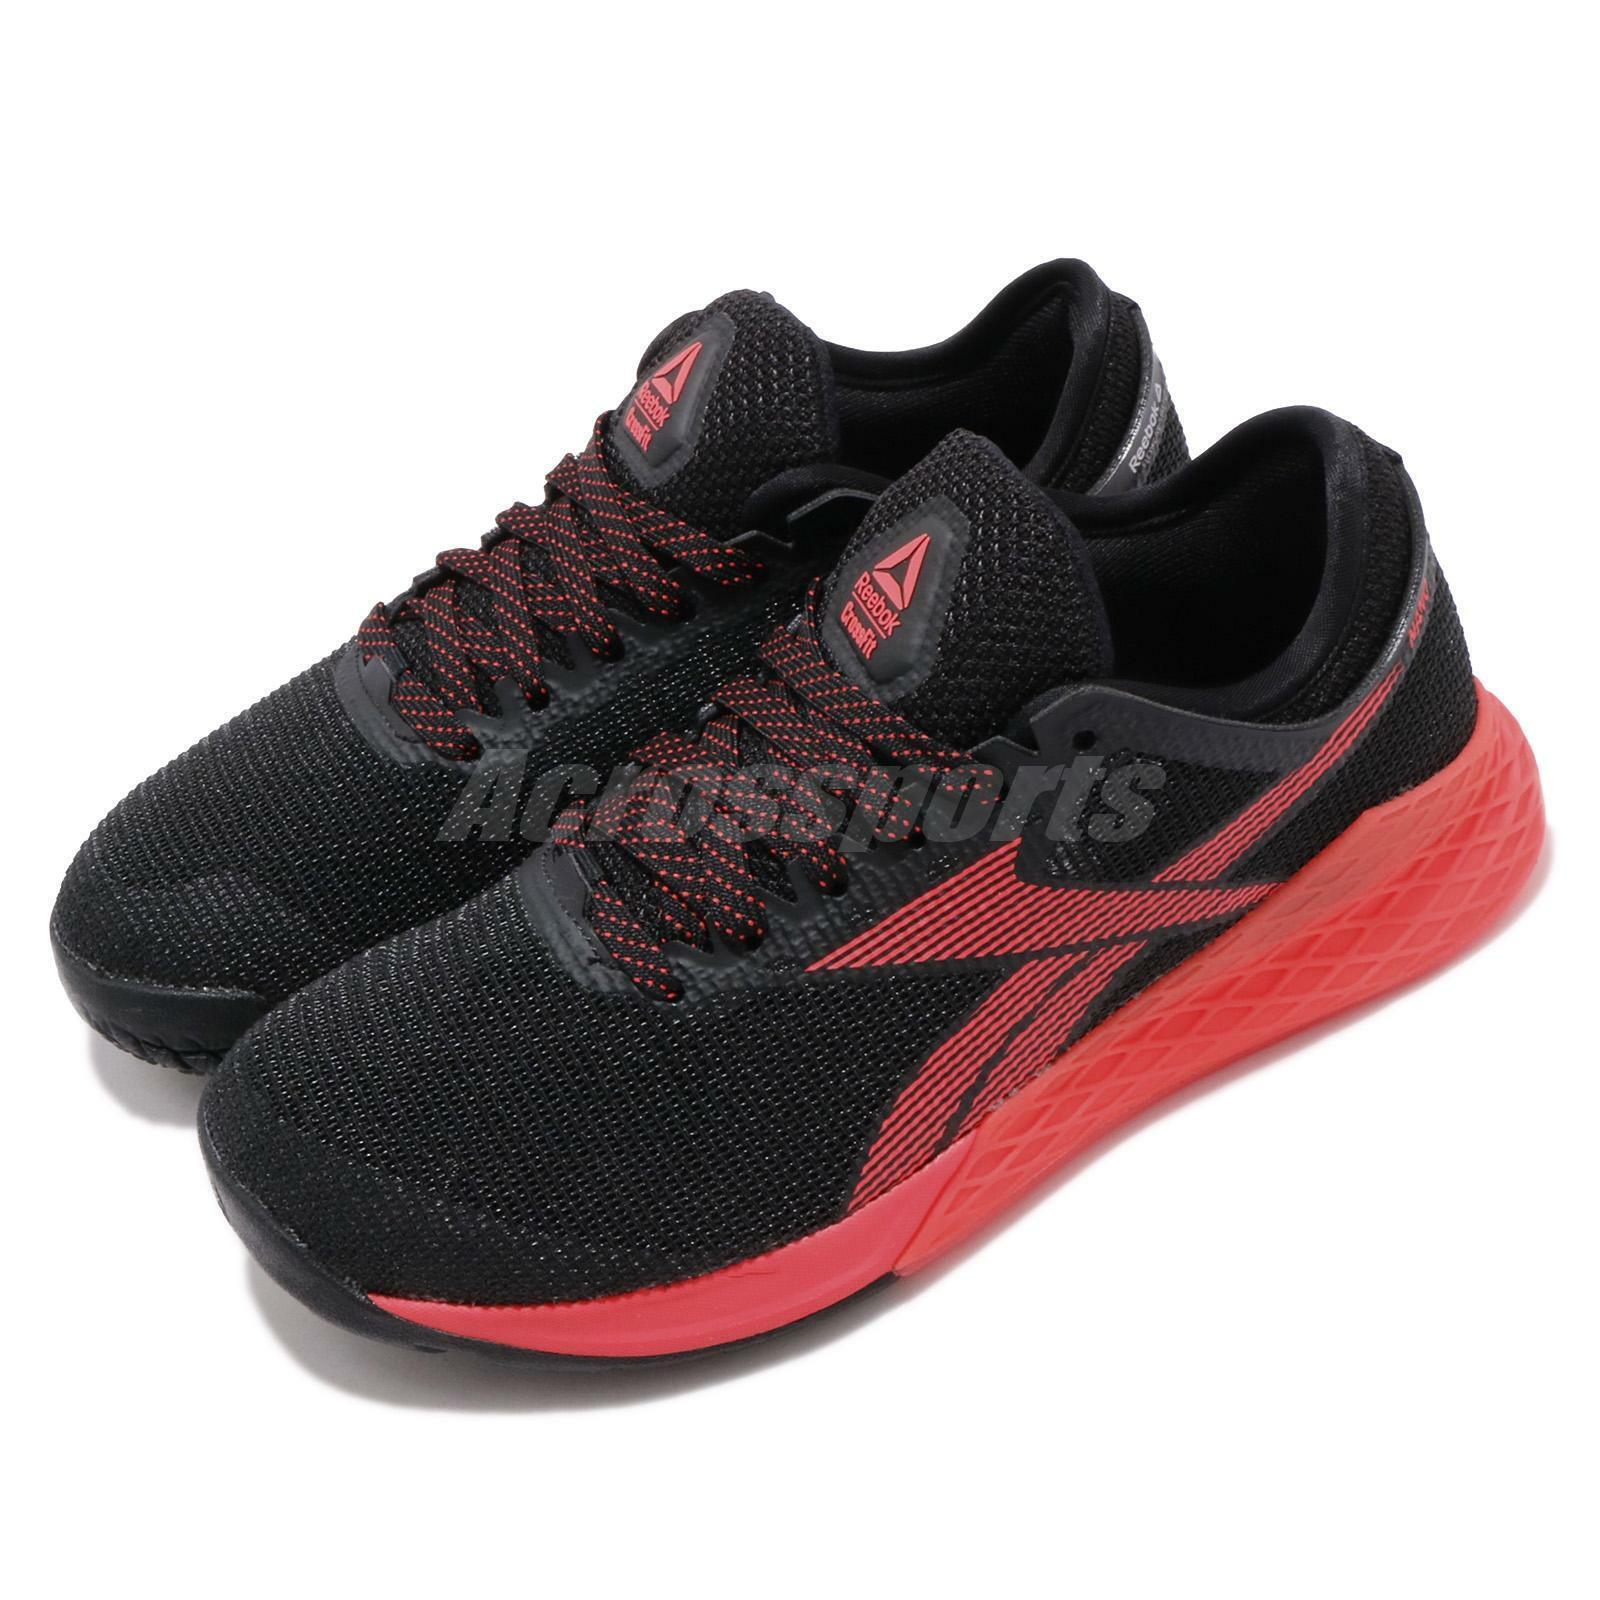 Reebok Nano 9 Noir Rouge Hommes Crossfit Cross Training paniers Chaussures FU6828